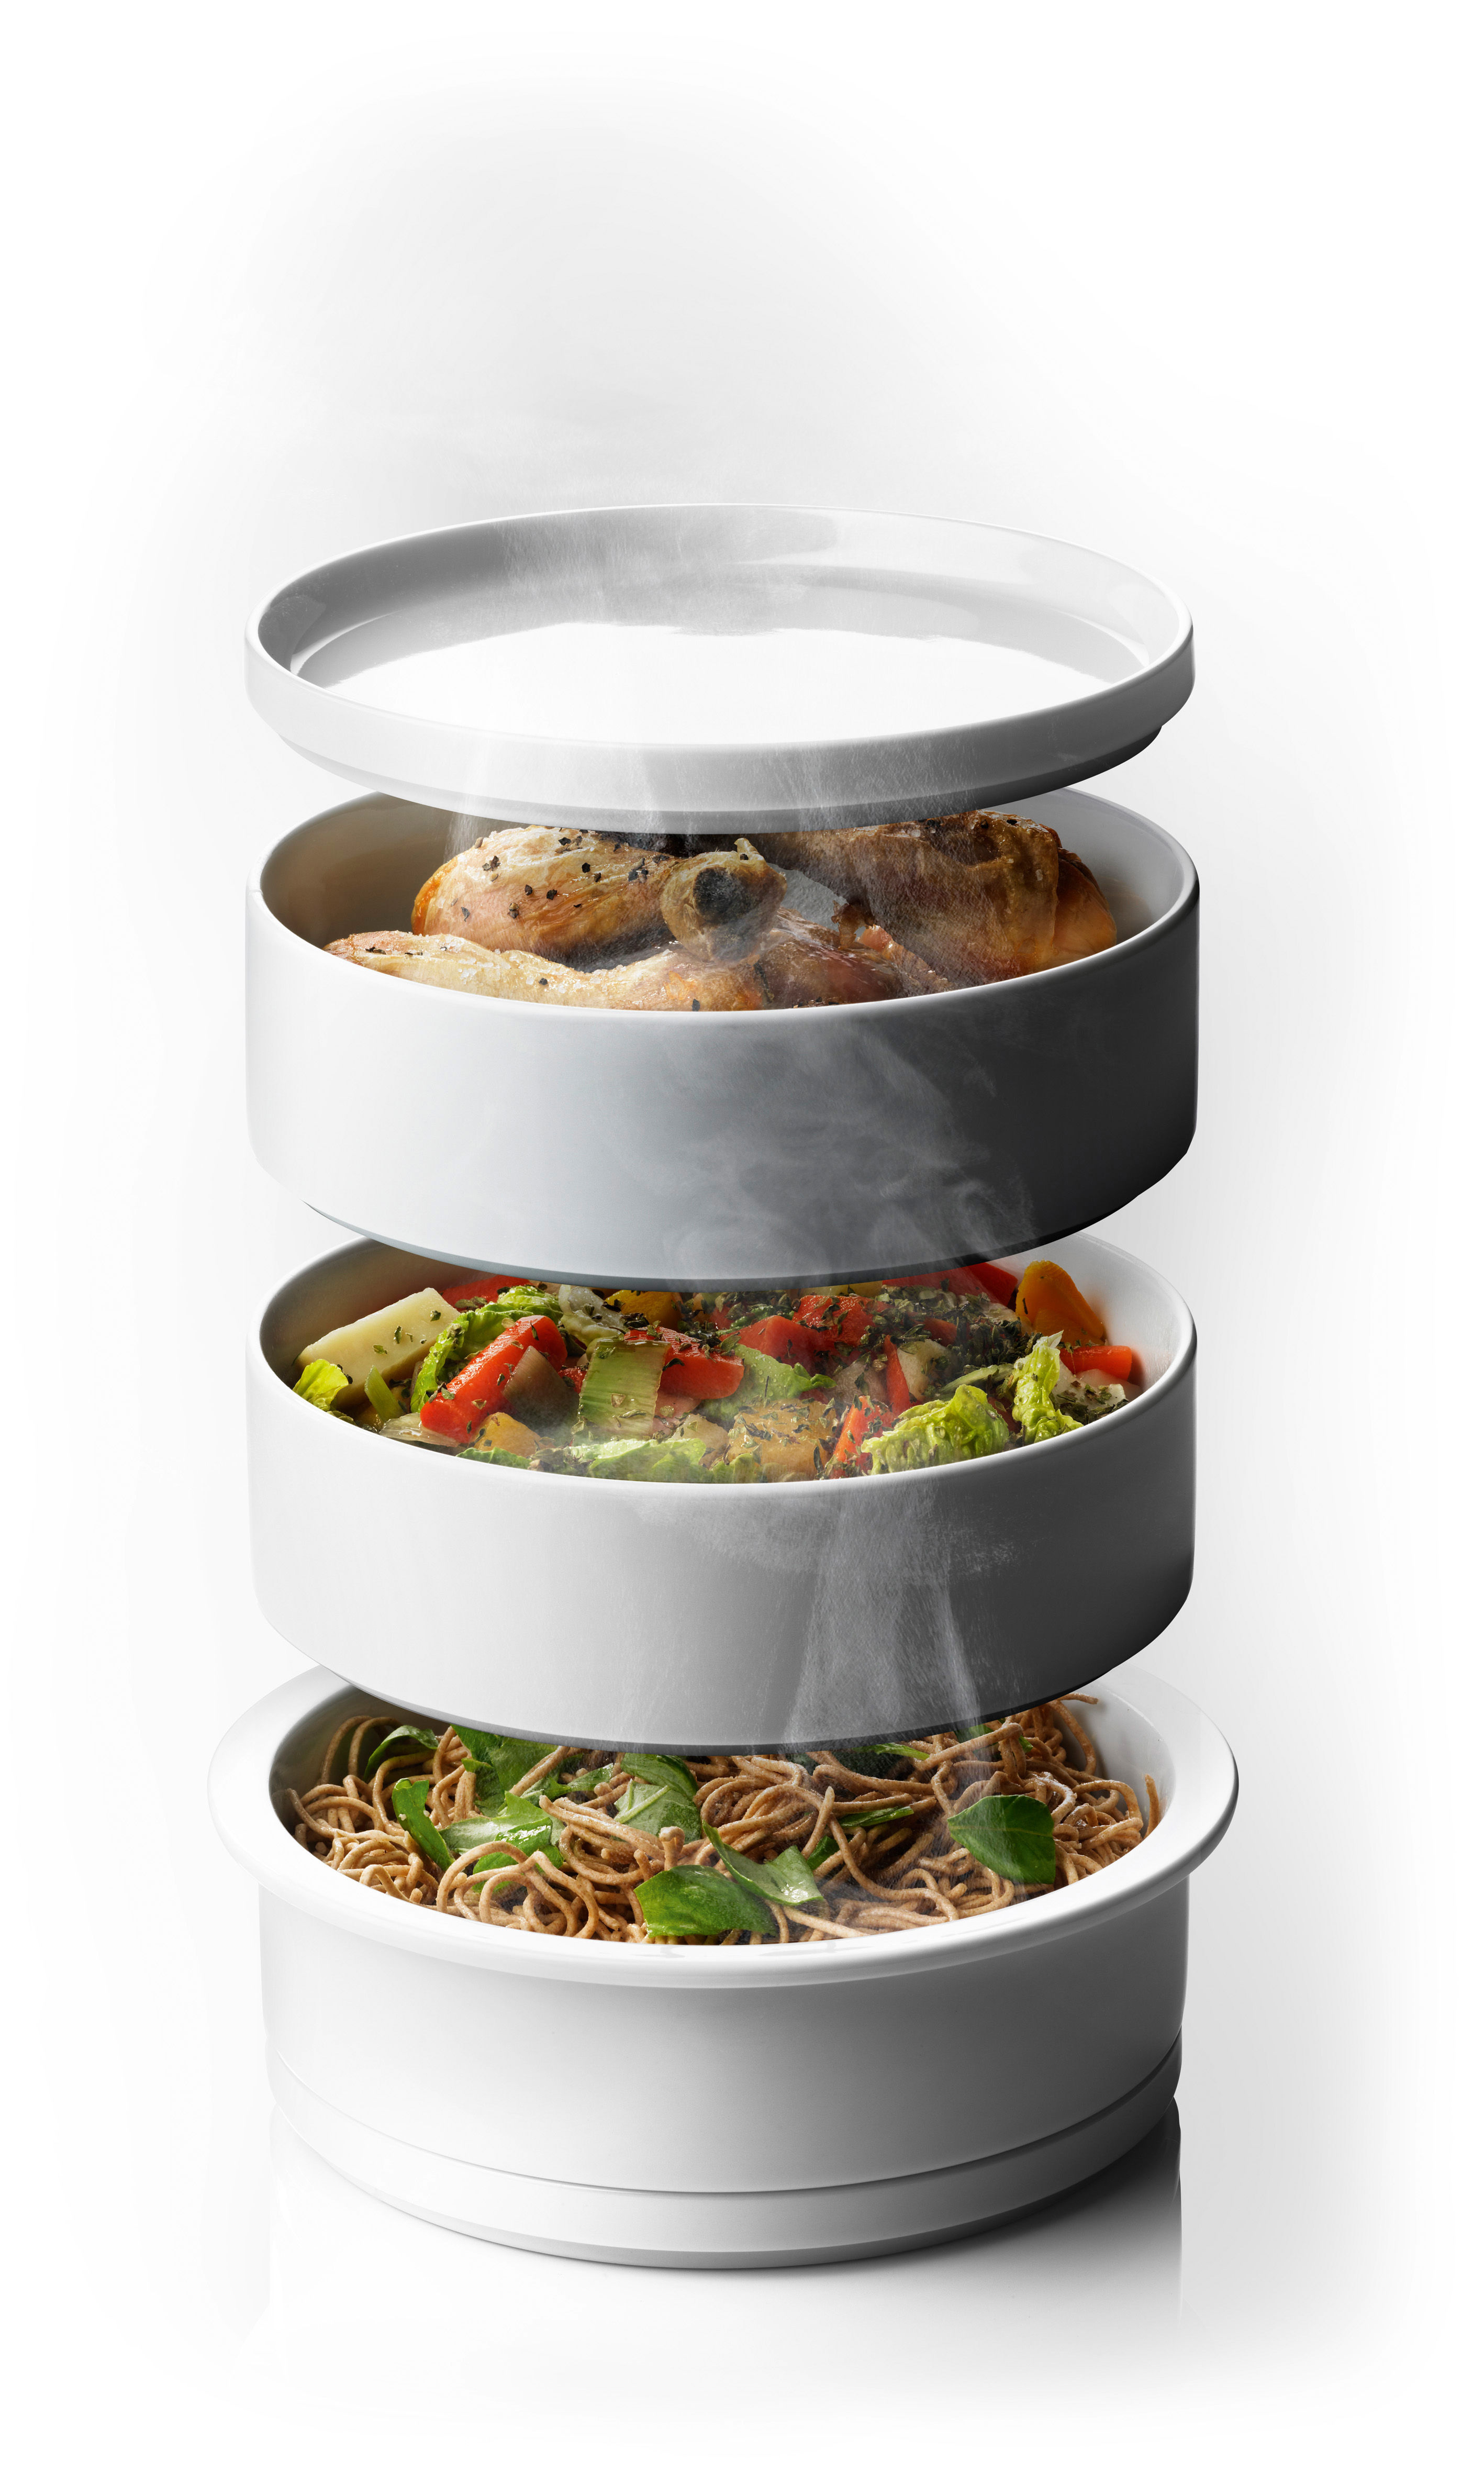 cuiseur vapeur steam tower pour cuisson au four blanc menu made in design. Black Bedroom Furniture Sets. Home Design Ideas